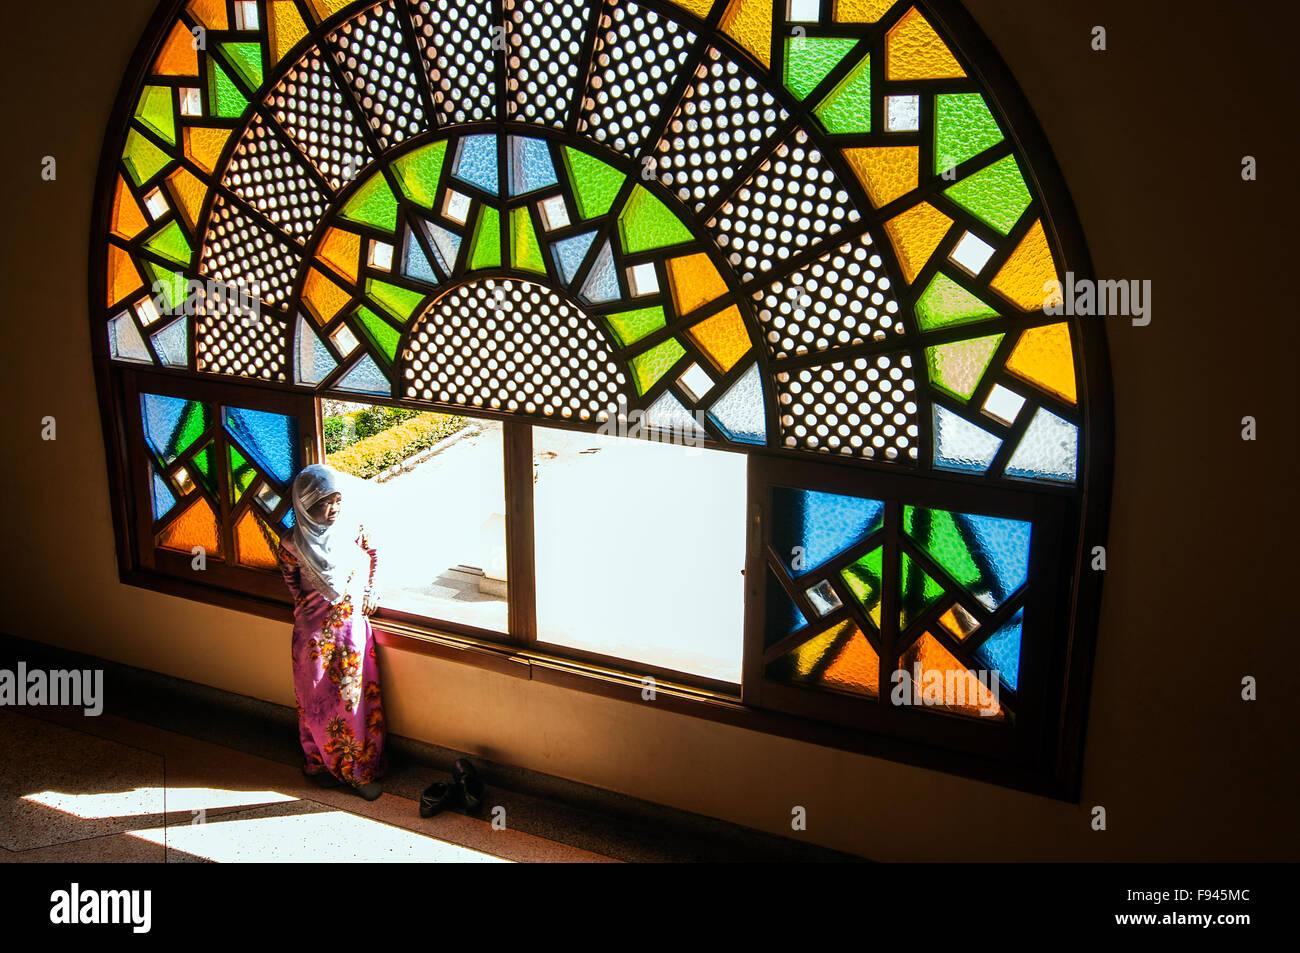 La pequeña niña a Gadafi La Mezquita Nacional, Kampala, Uganda Imagen De Stock